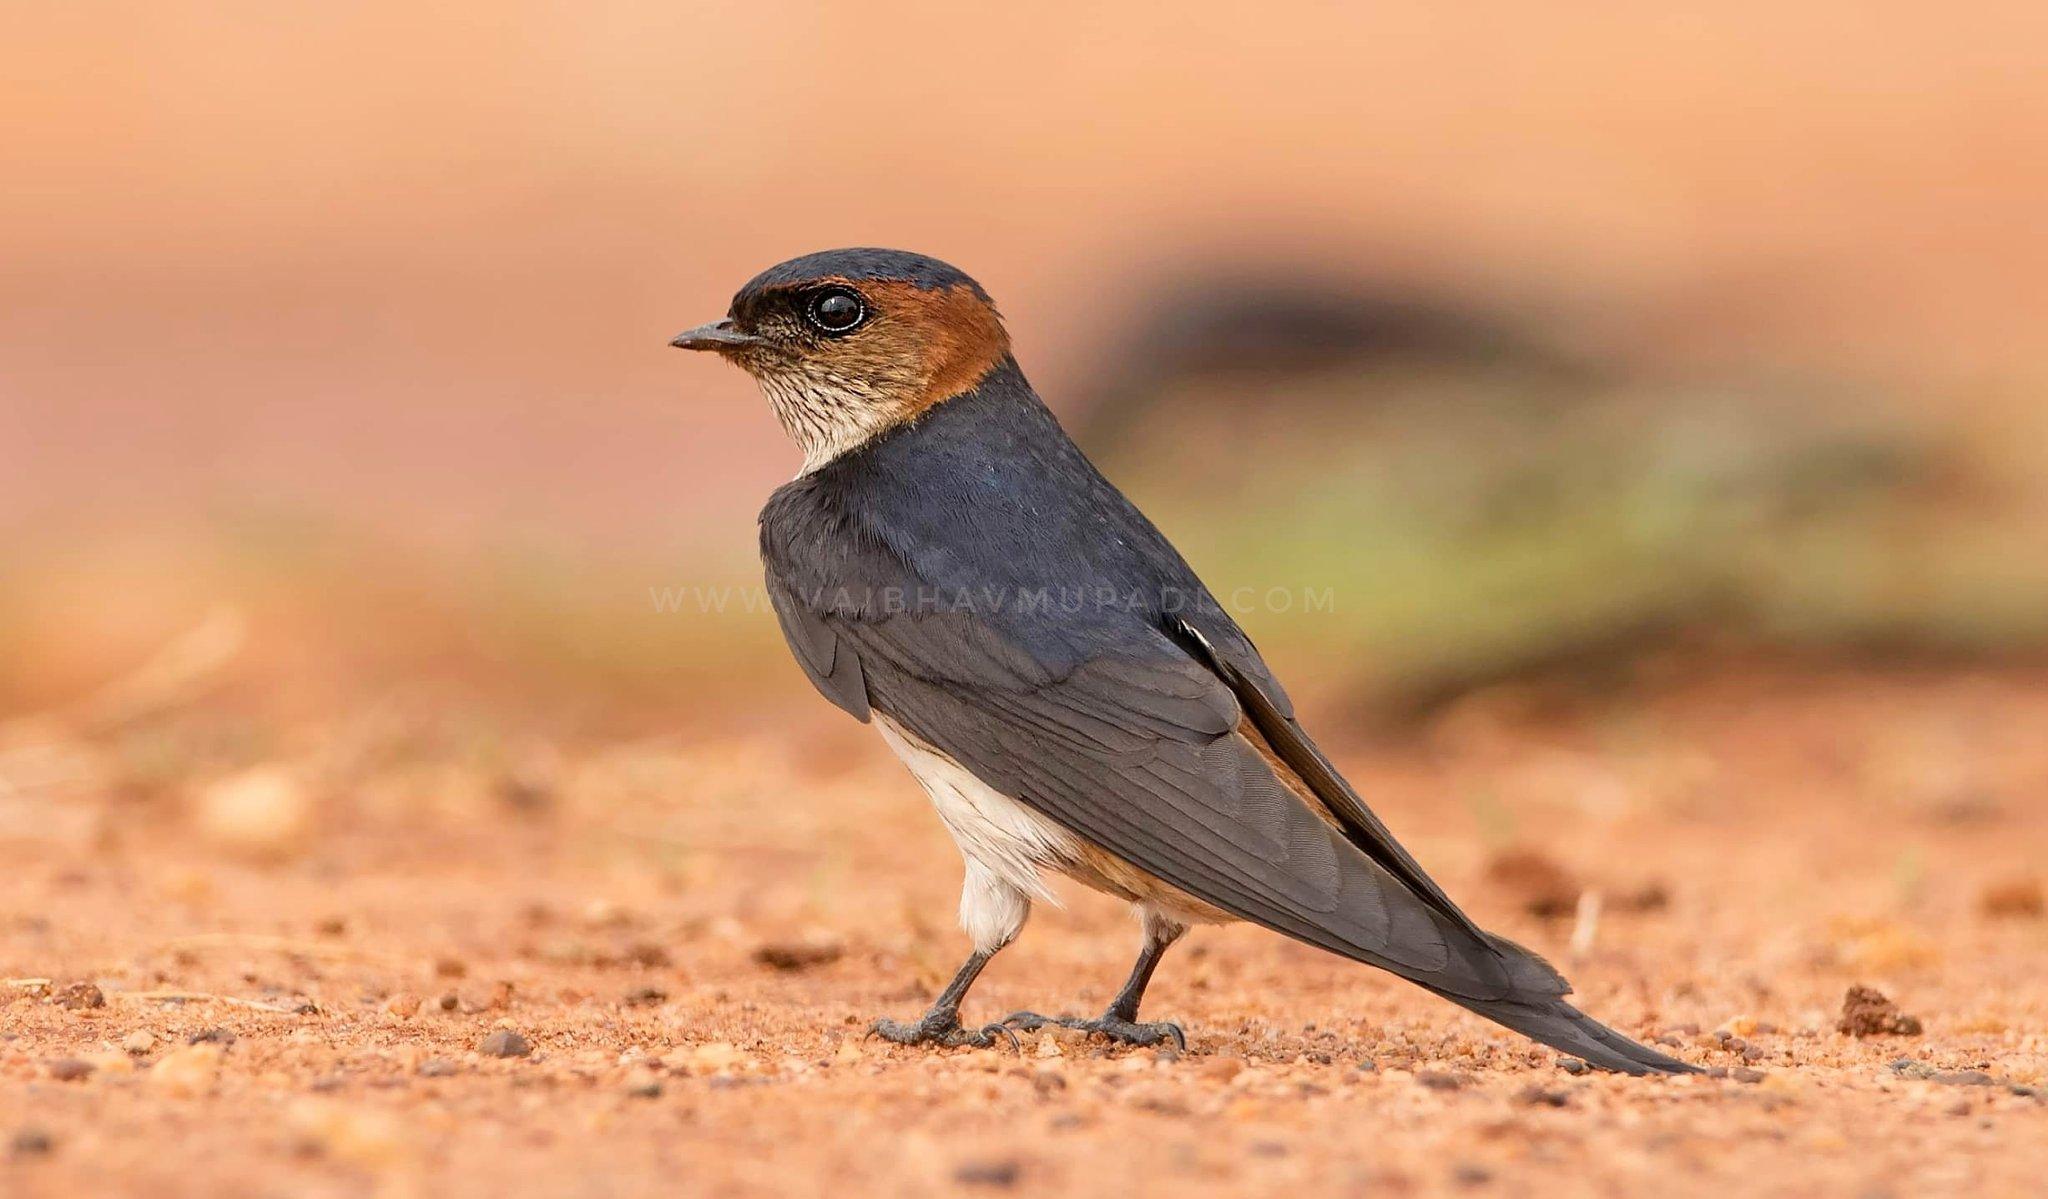 wildlife_photography_18.jpg